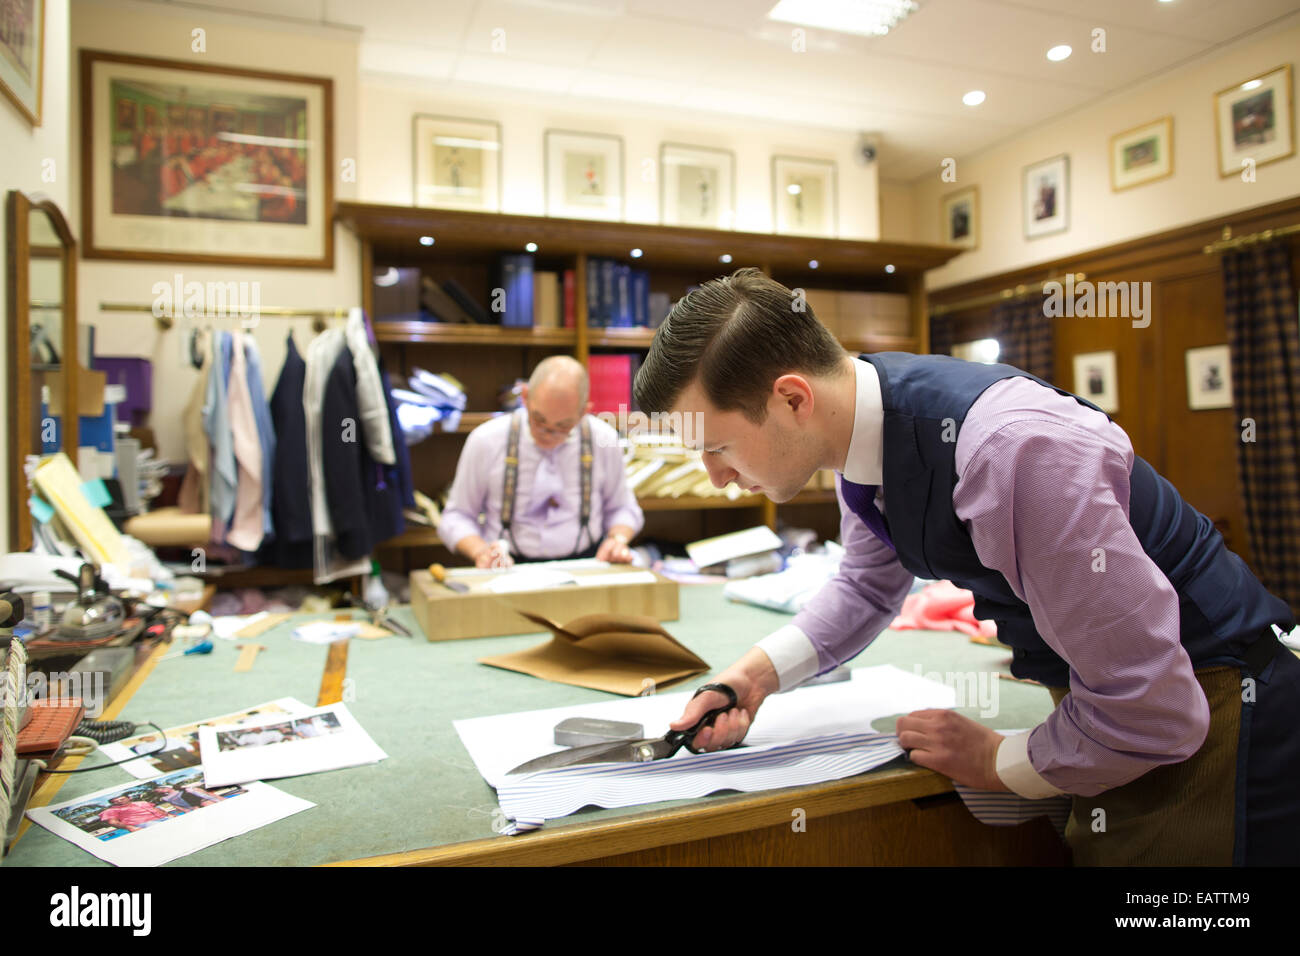 Dege & Skinner, family-owned tailoring house, Savile Row, Central London, England, UK - Stock Image